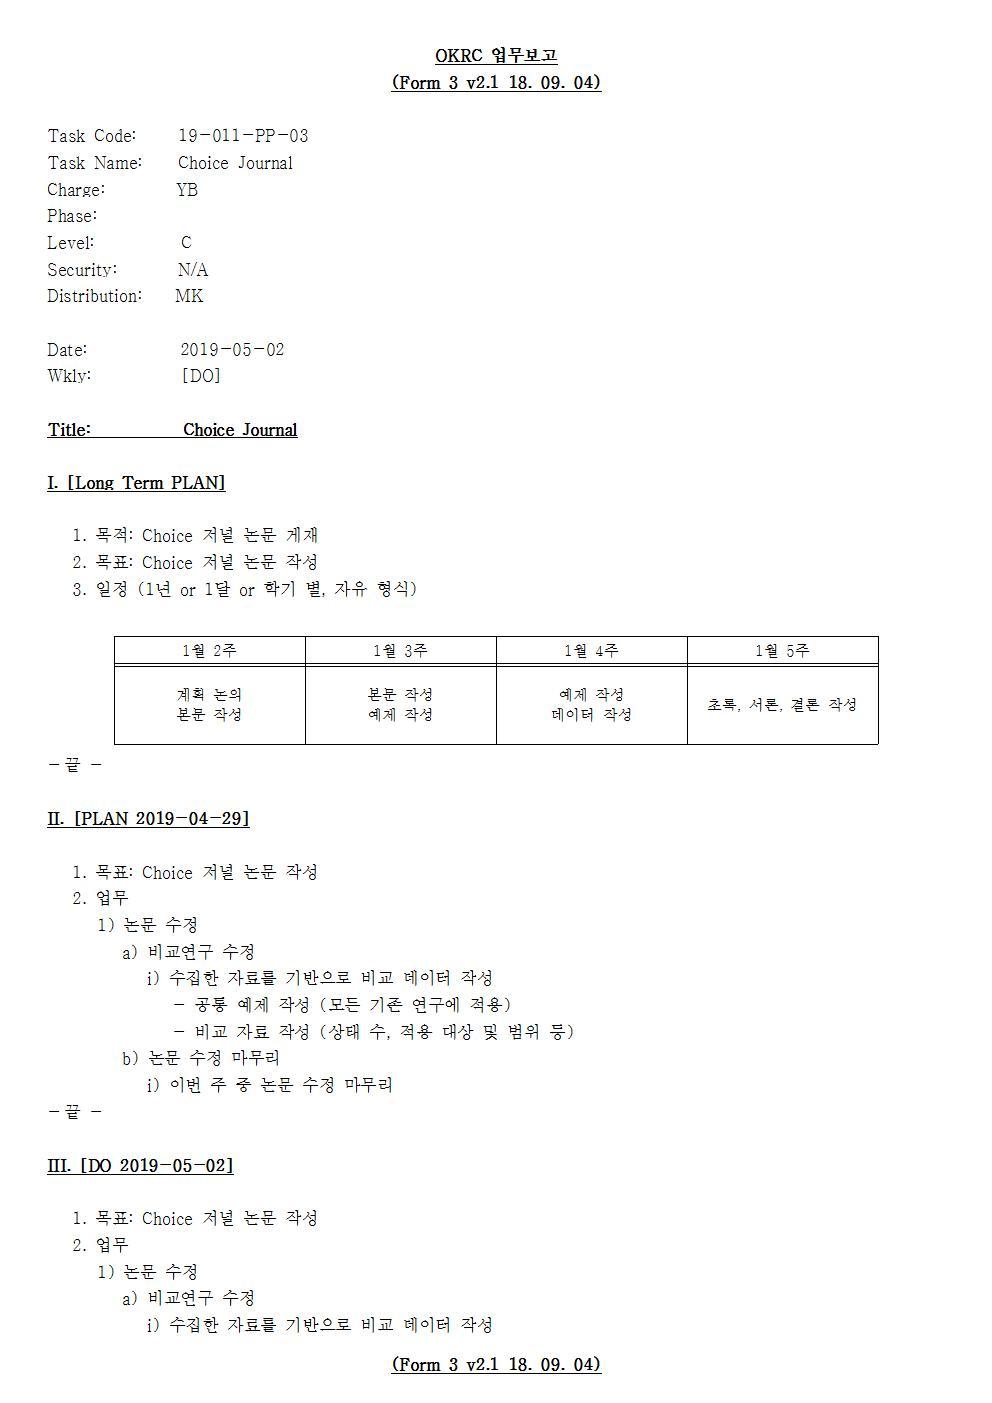 D-[19-011-PP-03]-[Choice Journal]-[2019-05-02][YB]001.jpg